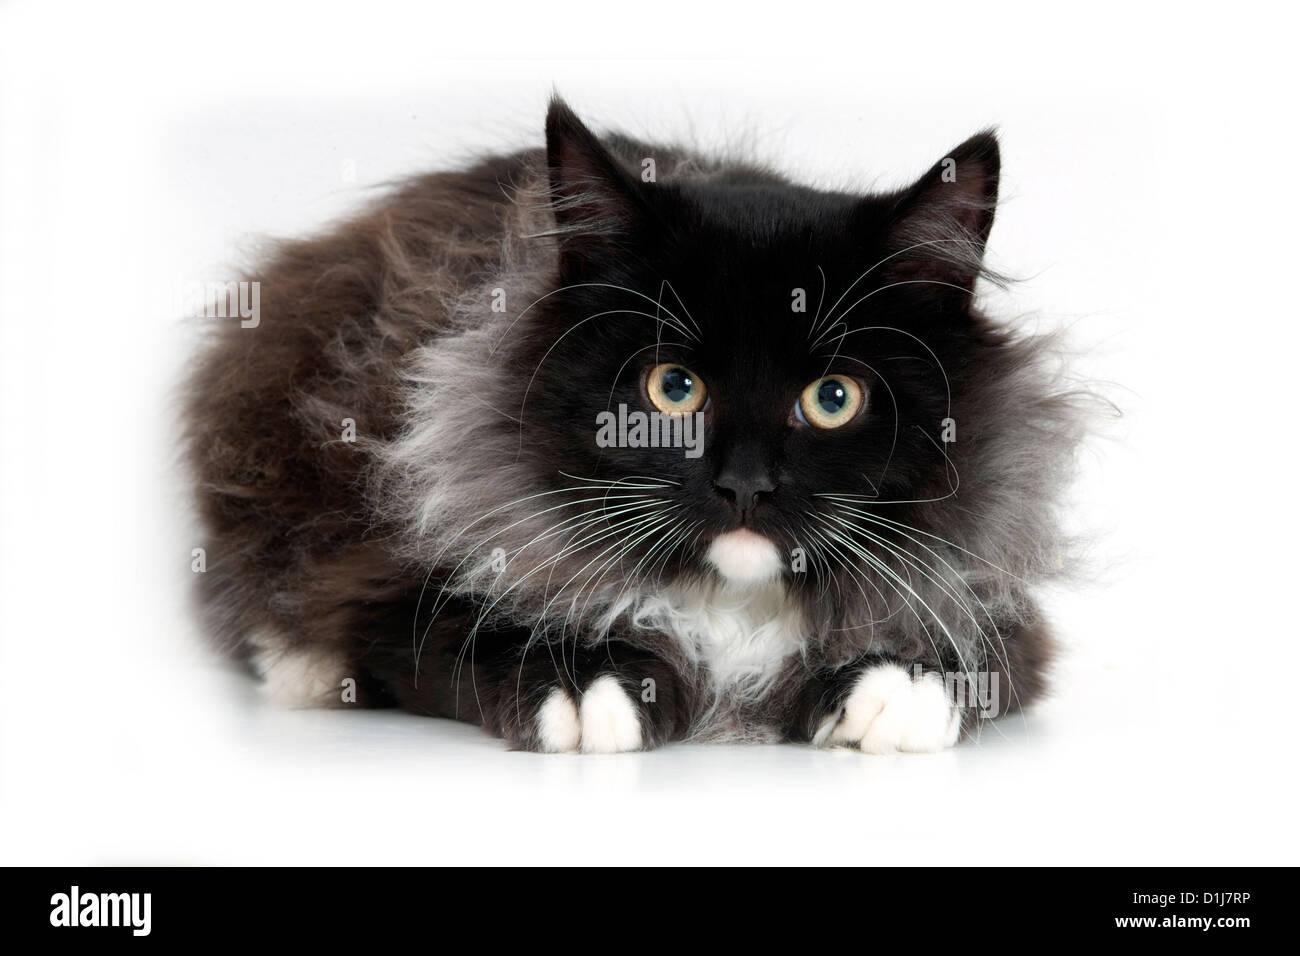 Siberian cat - Stock Image